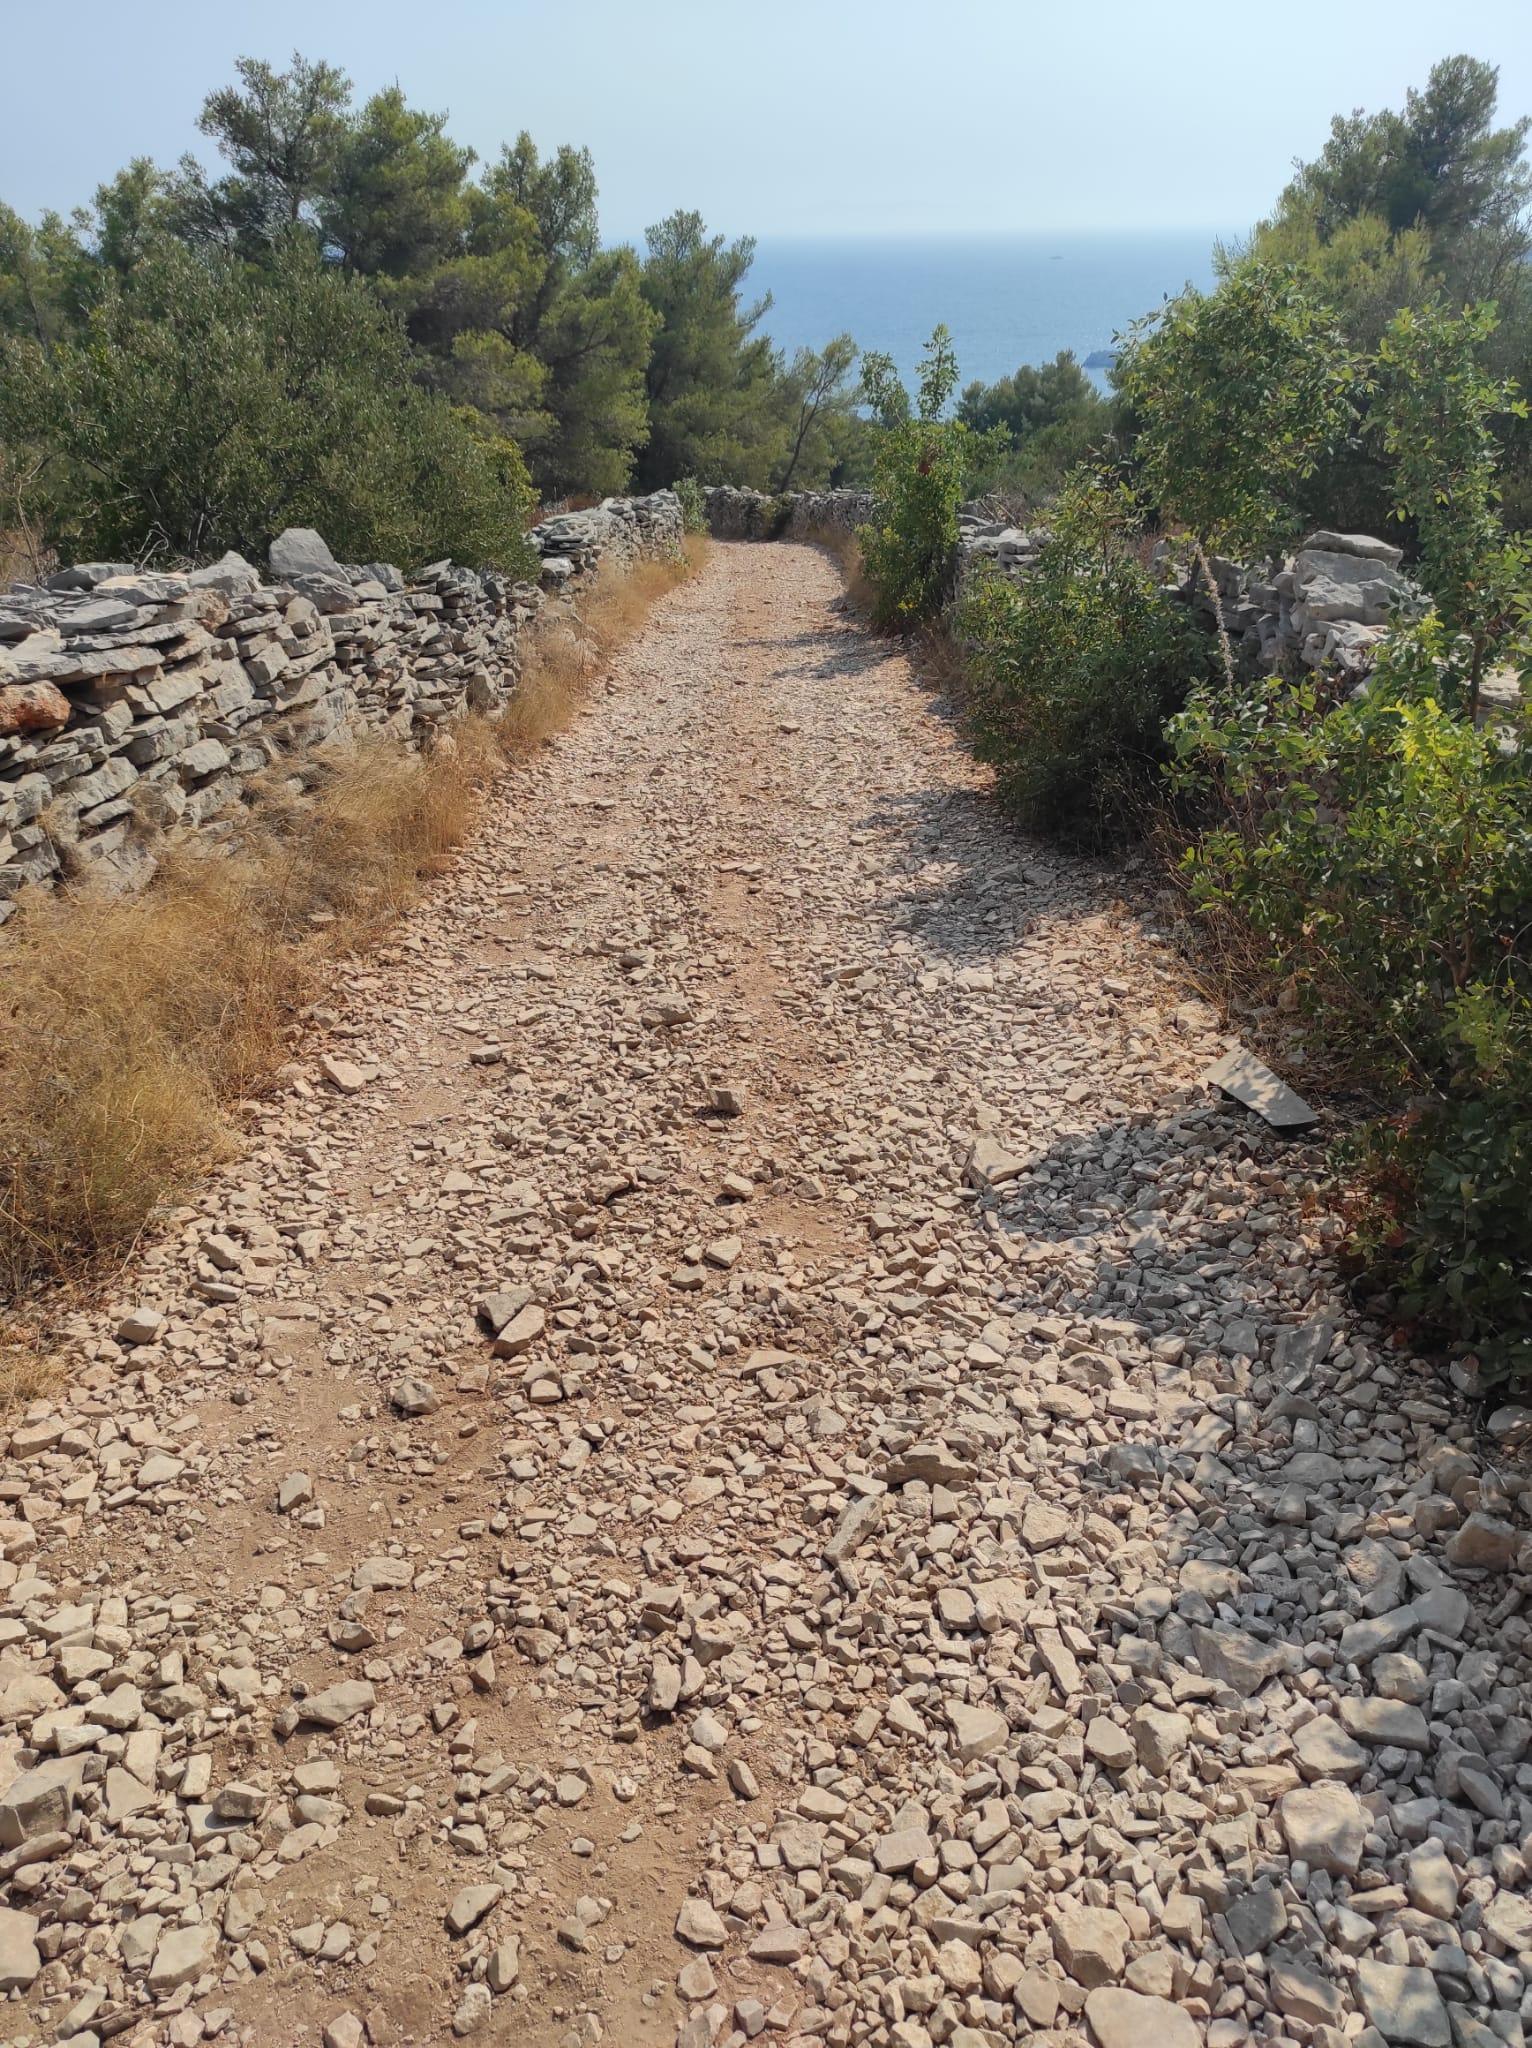 Macadam road to Tatinja bay